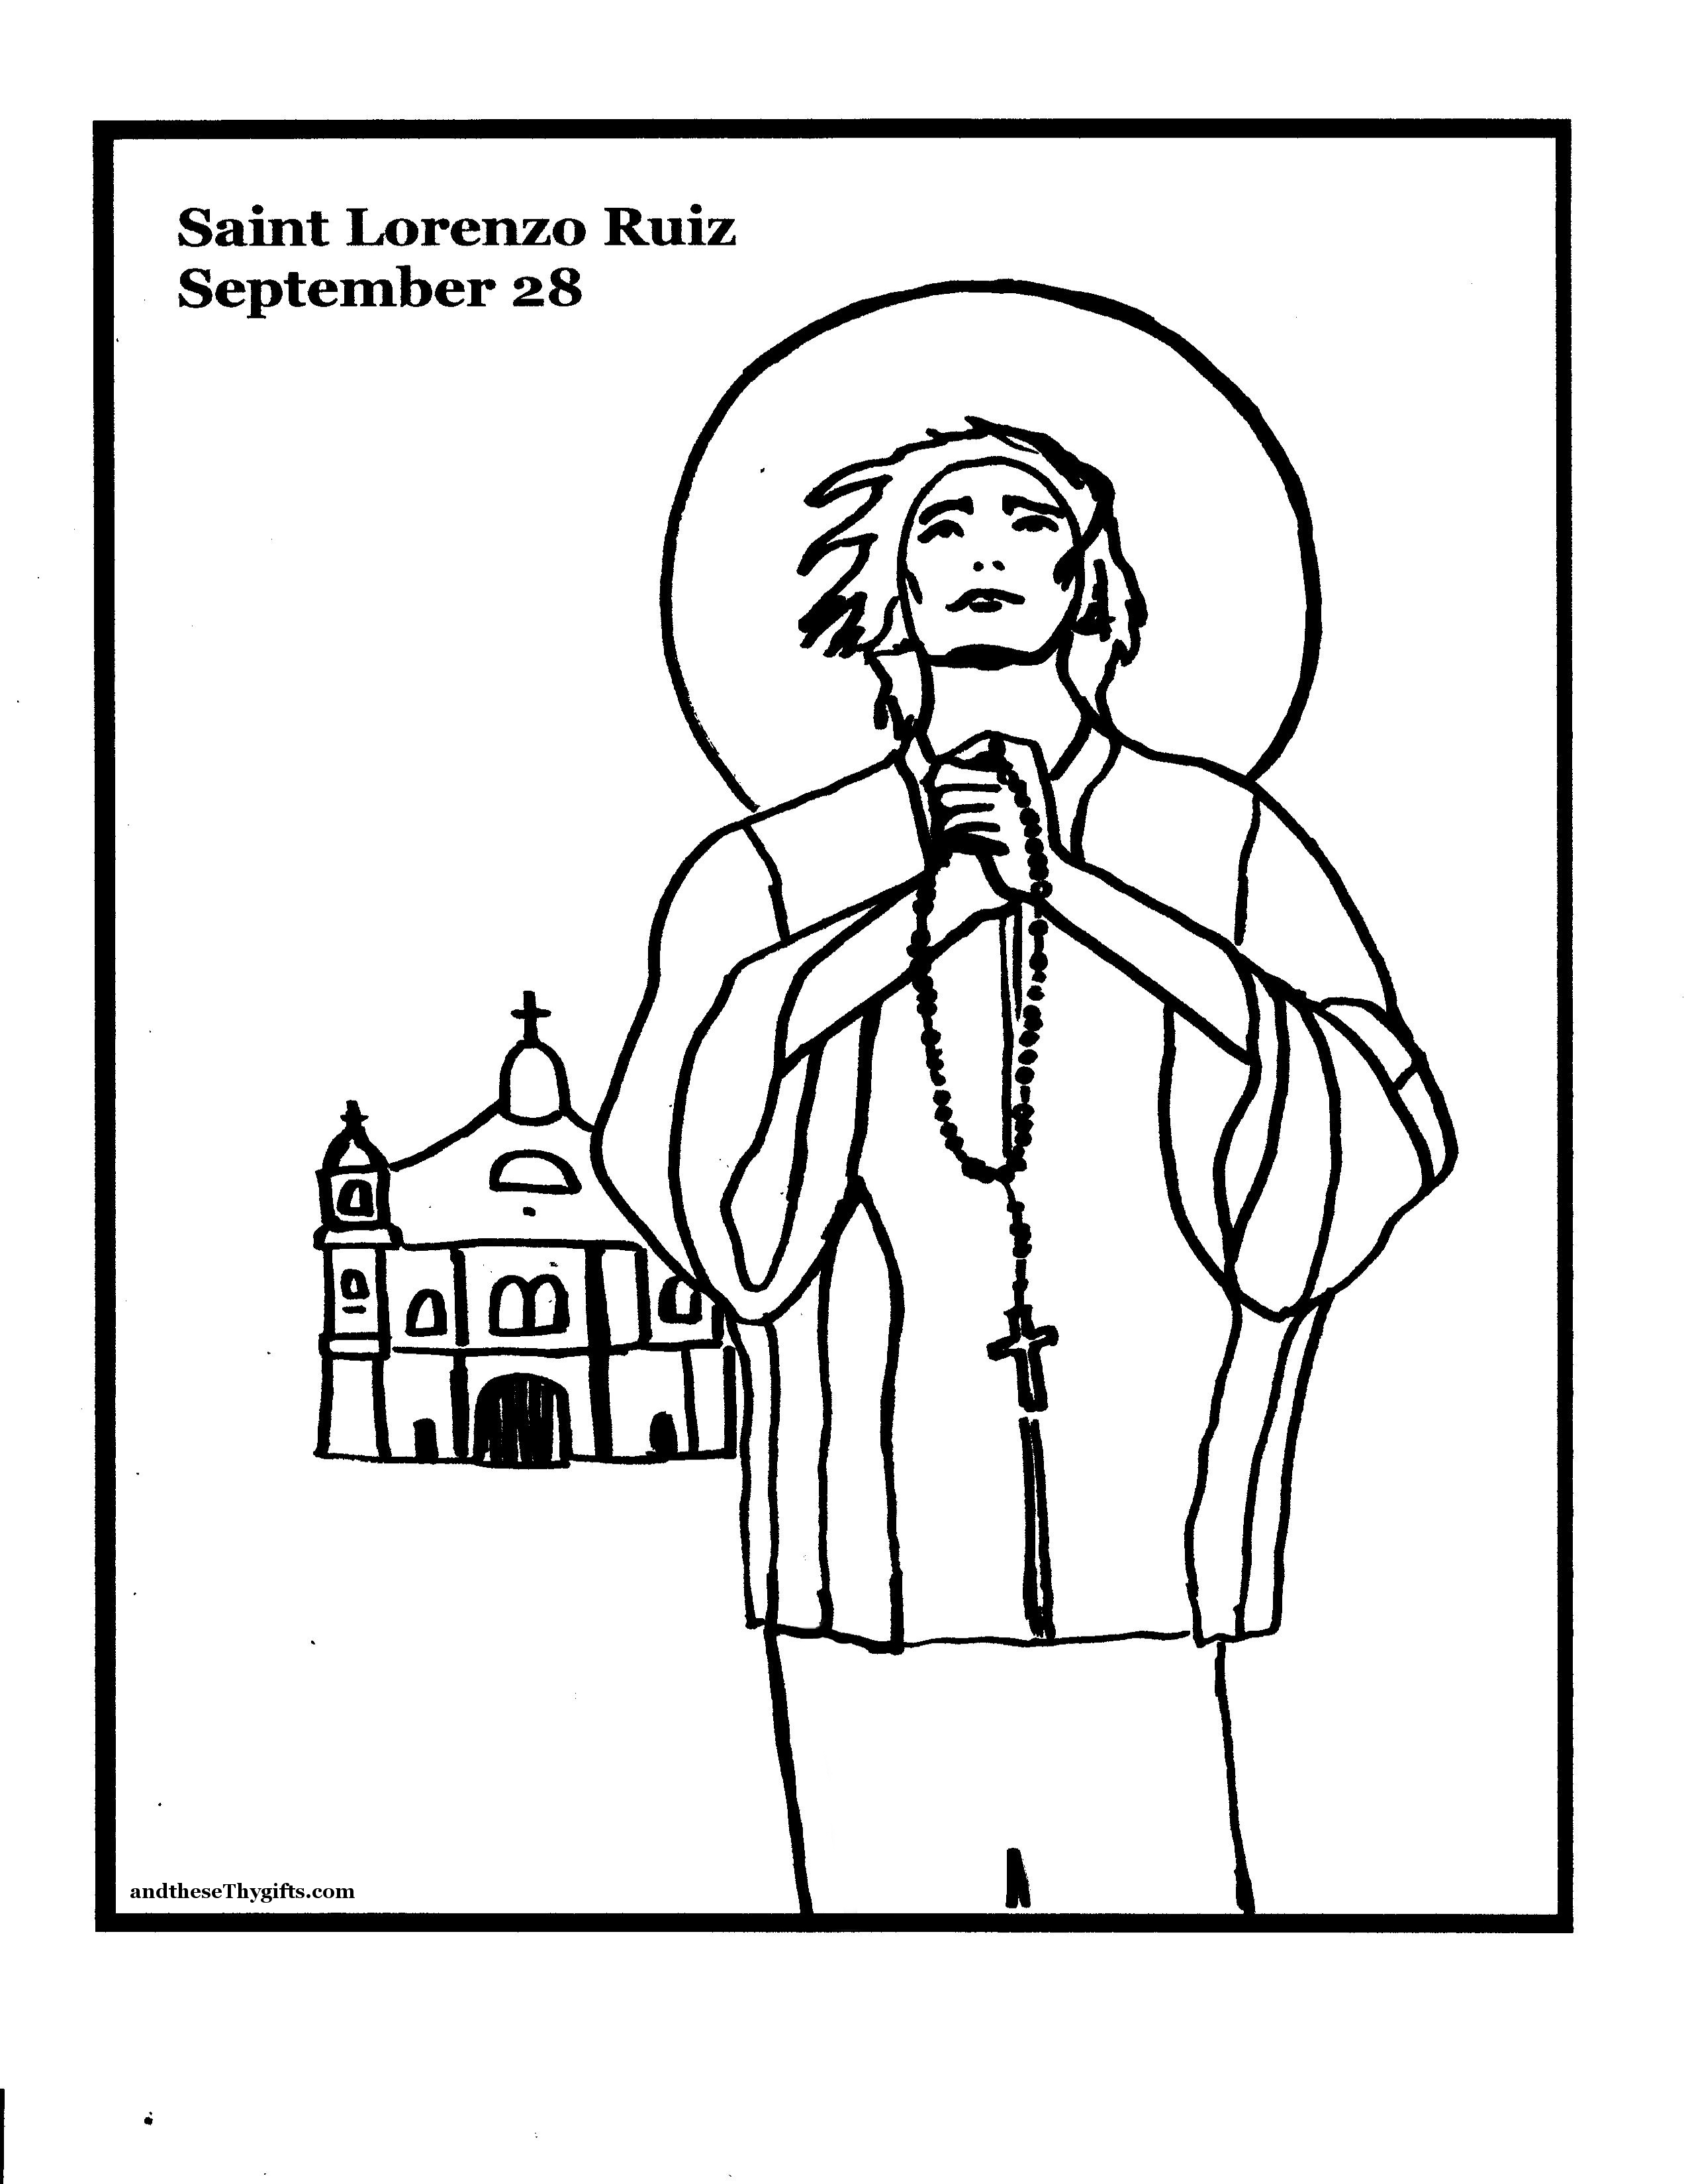 St. Lorenzo Ruiz Coloring Page